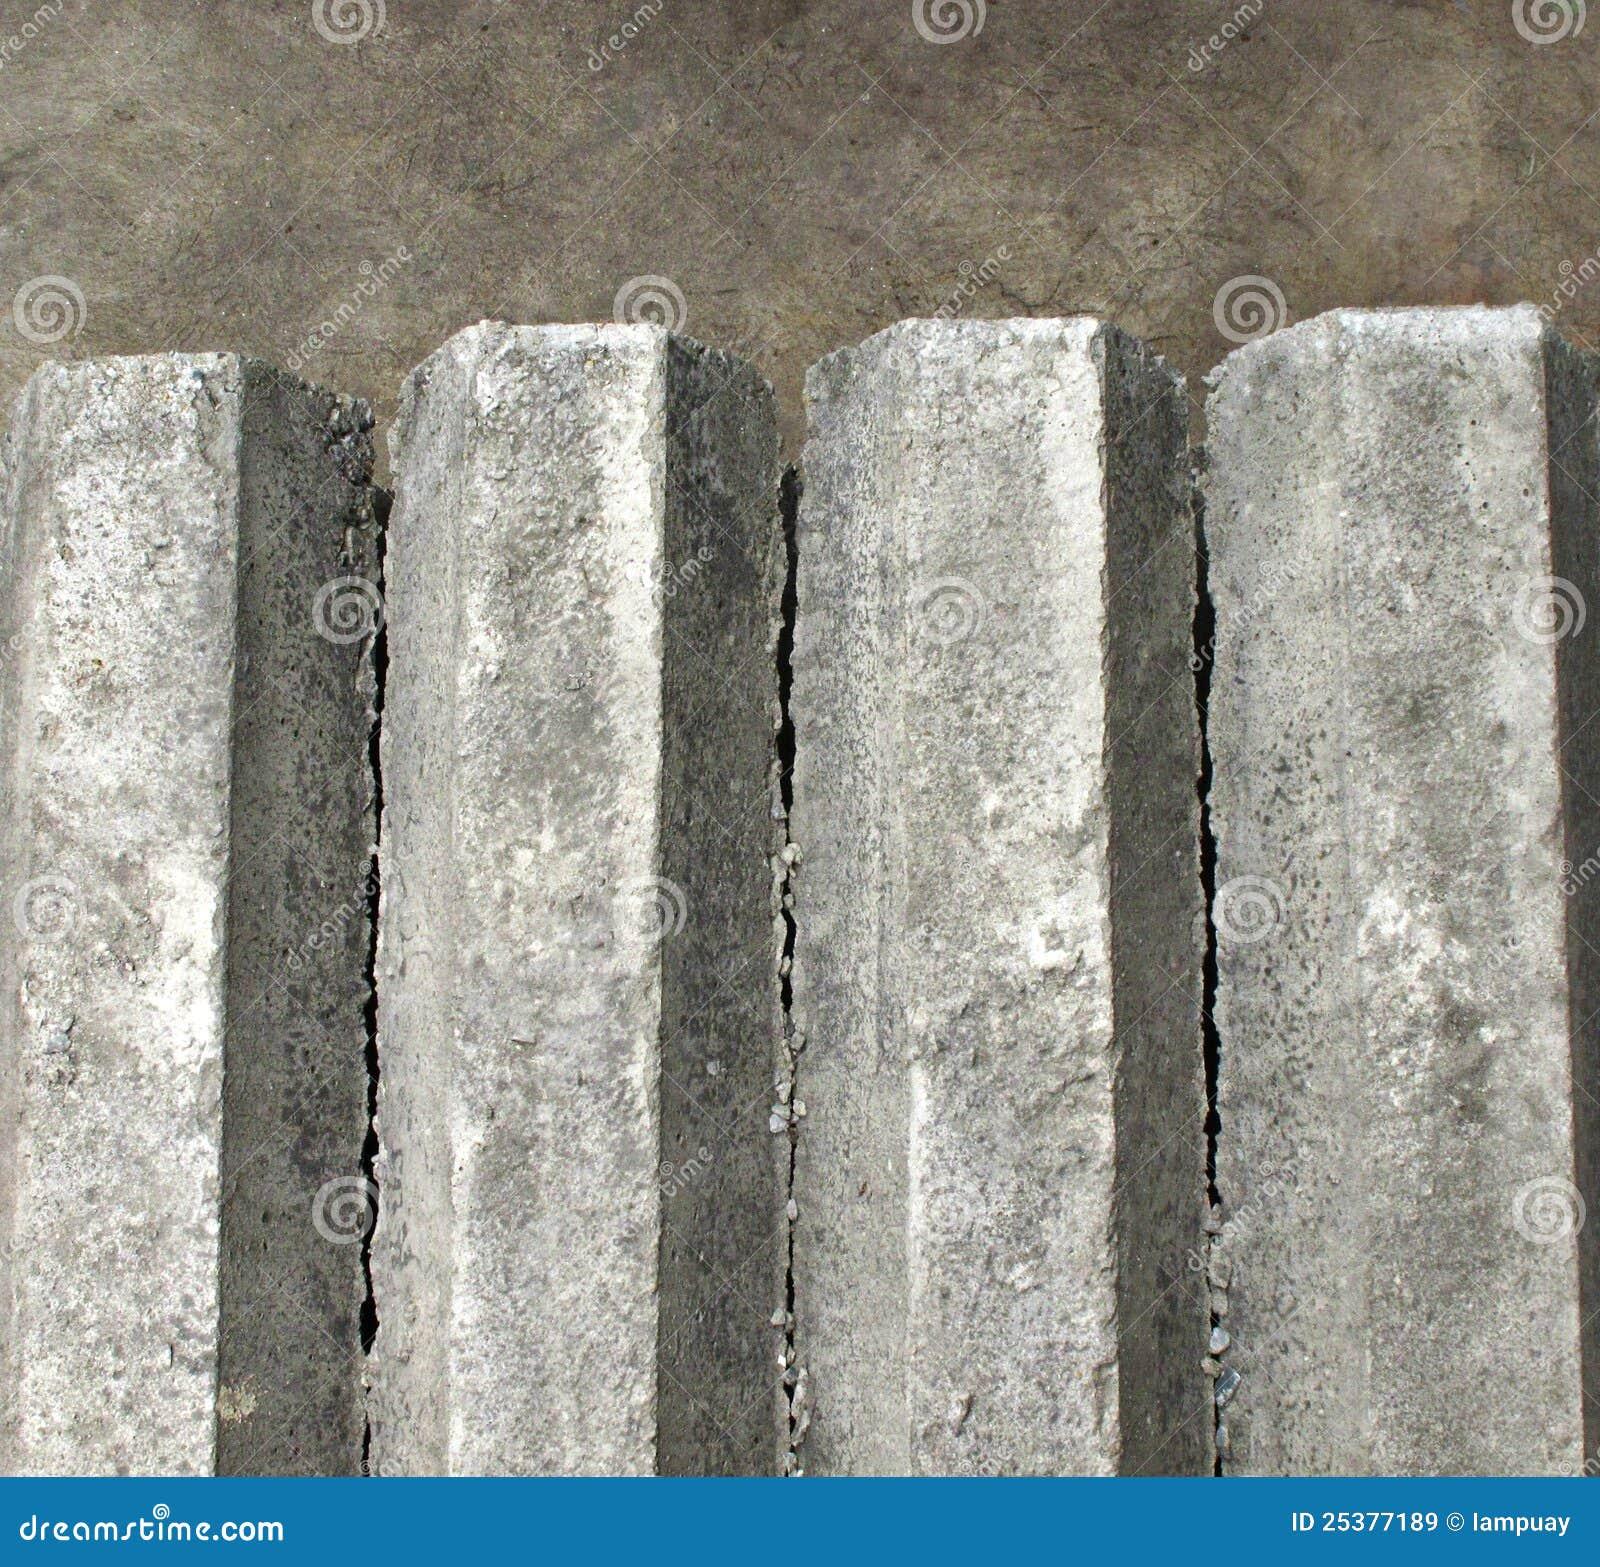 Hexagon Concrete Pillar On Floor Royalty Free Stock Images